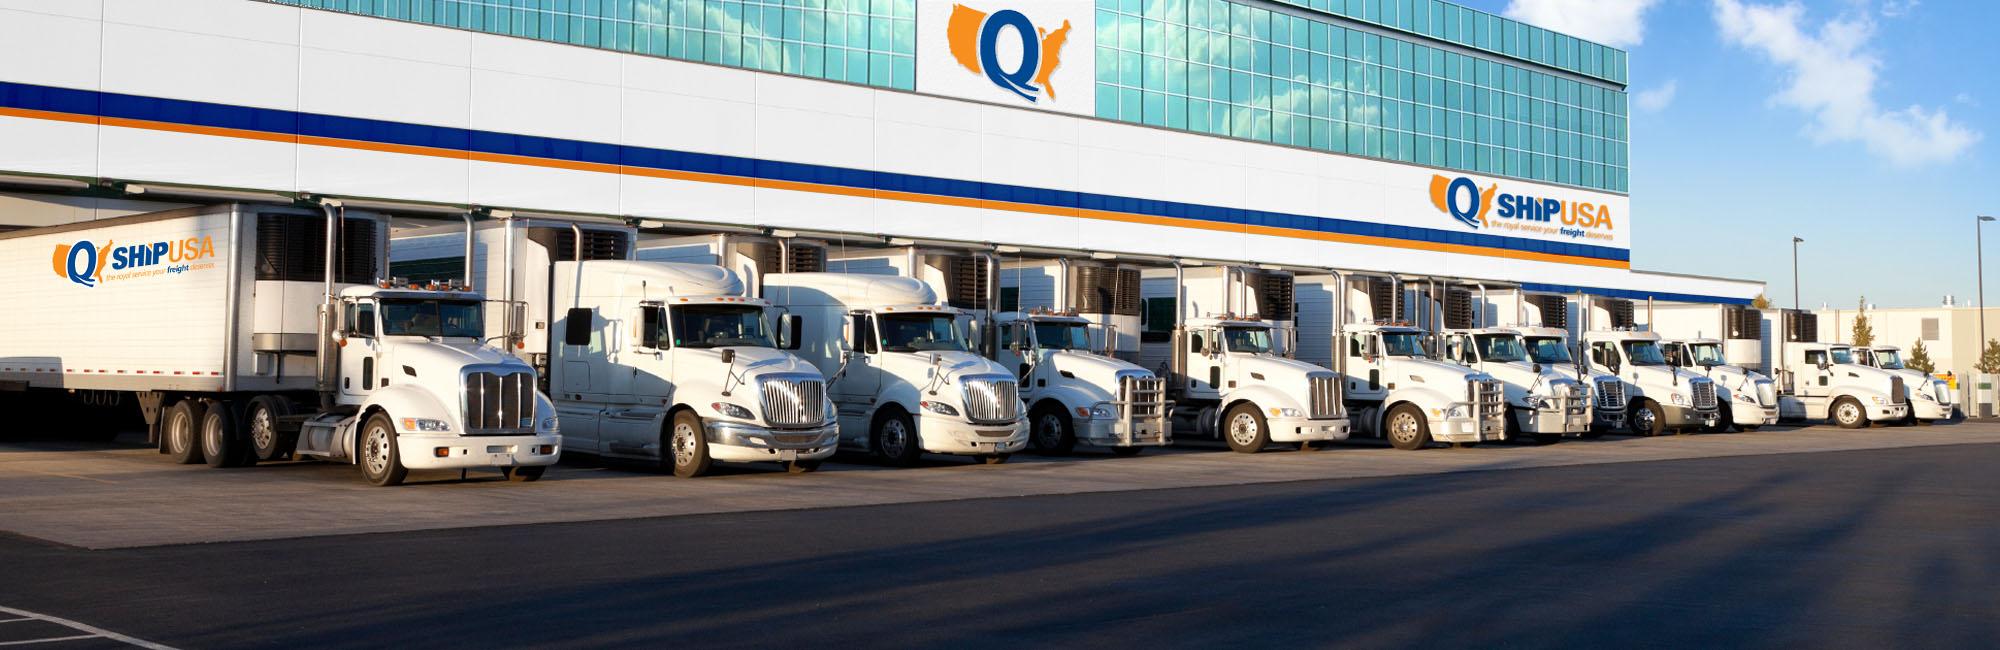 Freight Quote Ltl Q Ship Usa  Freight Broker  Ltl  Truckload  Rail  Reefer Trucking